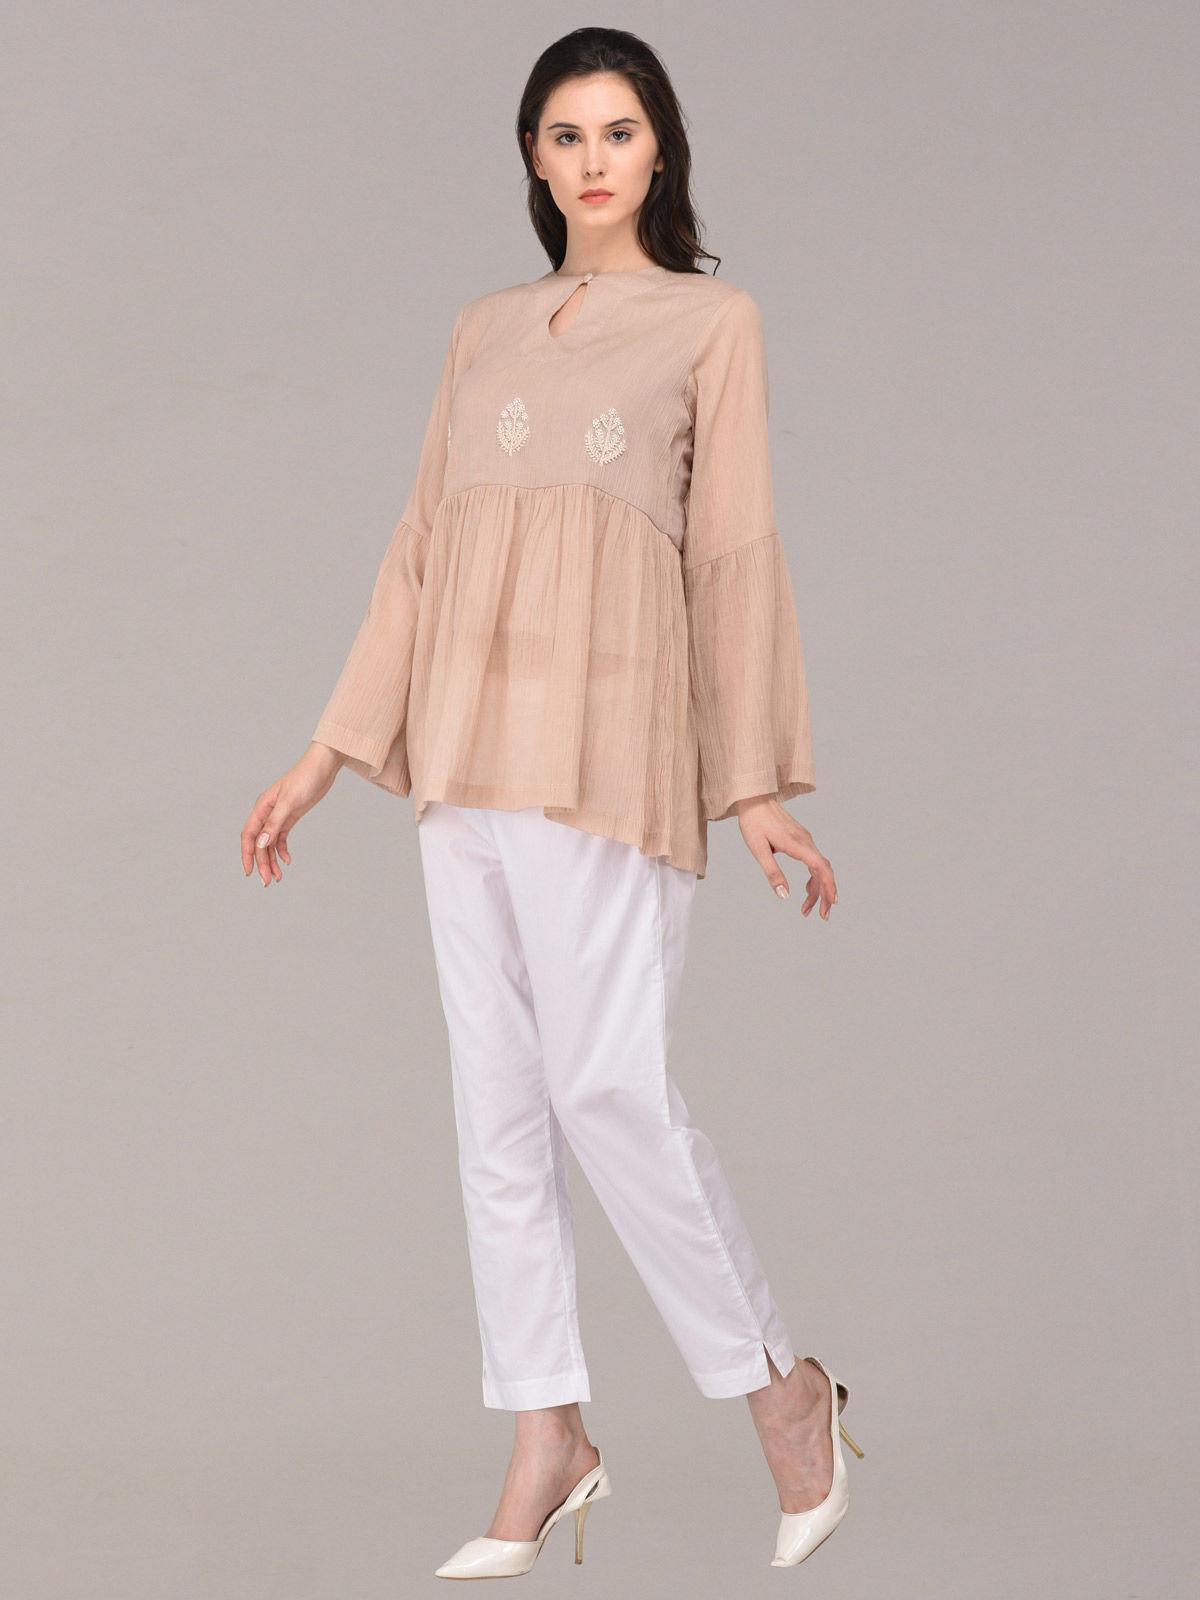 Panachee hand embroidered beige pure cotton top